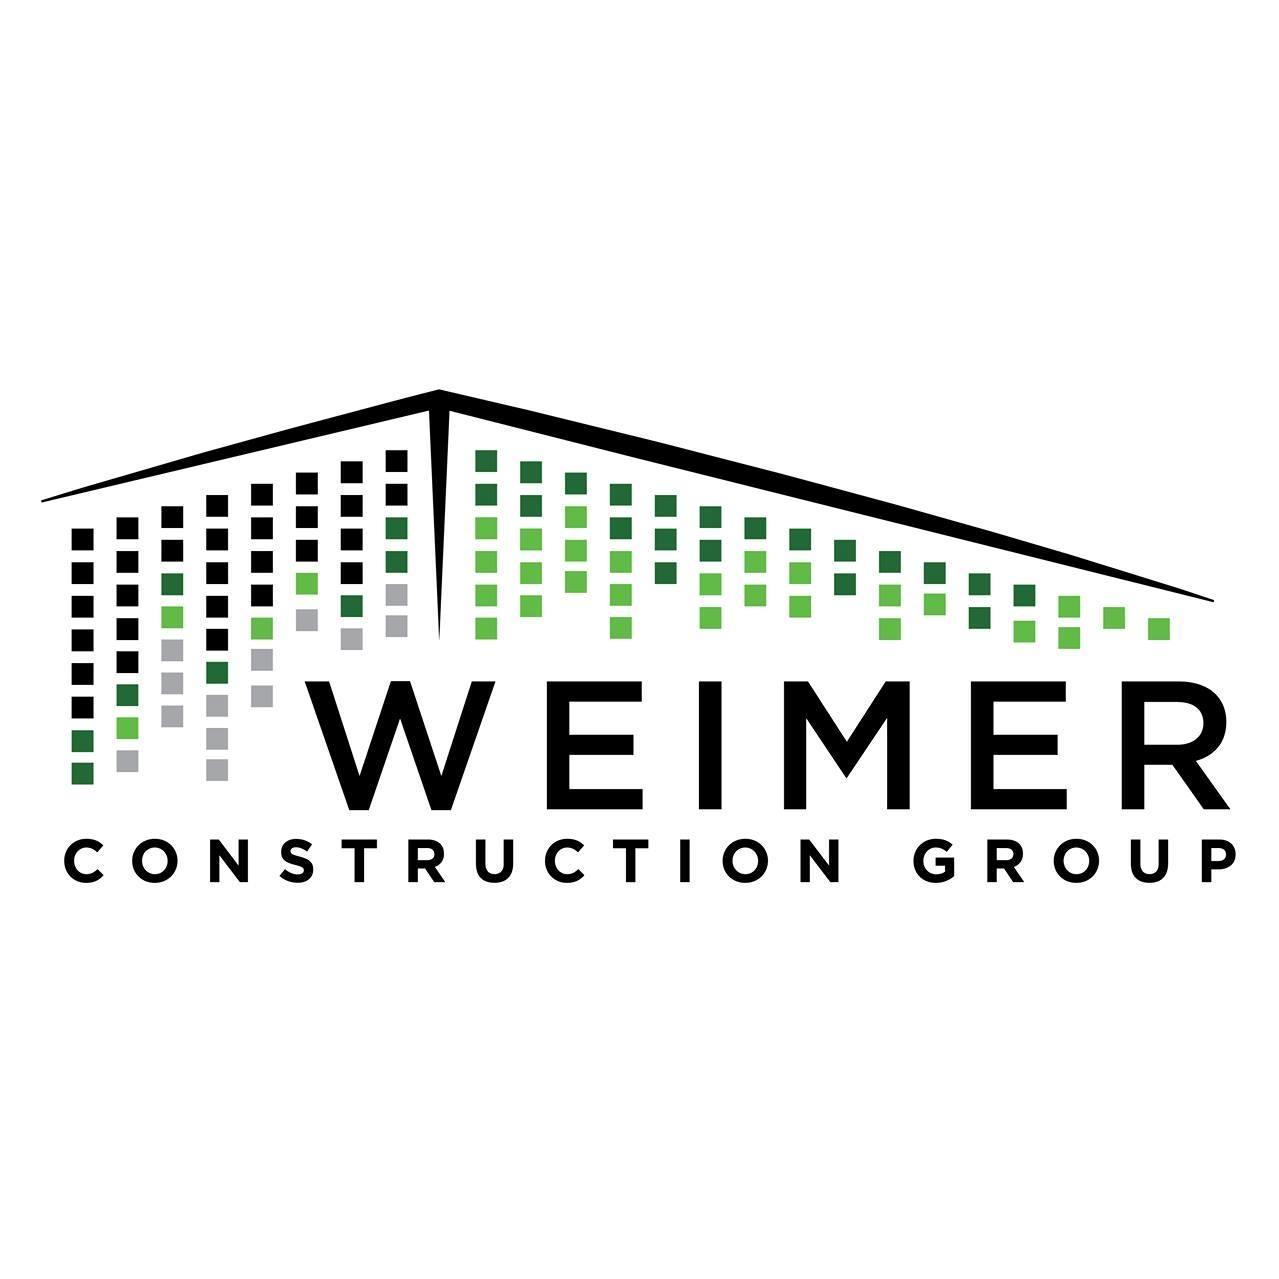 Weimer Construction Group